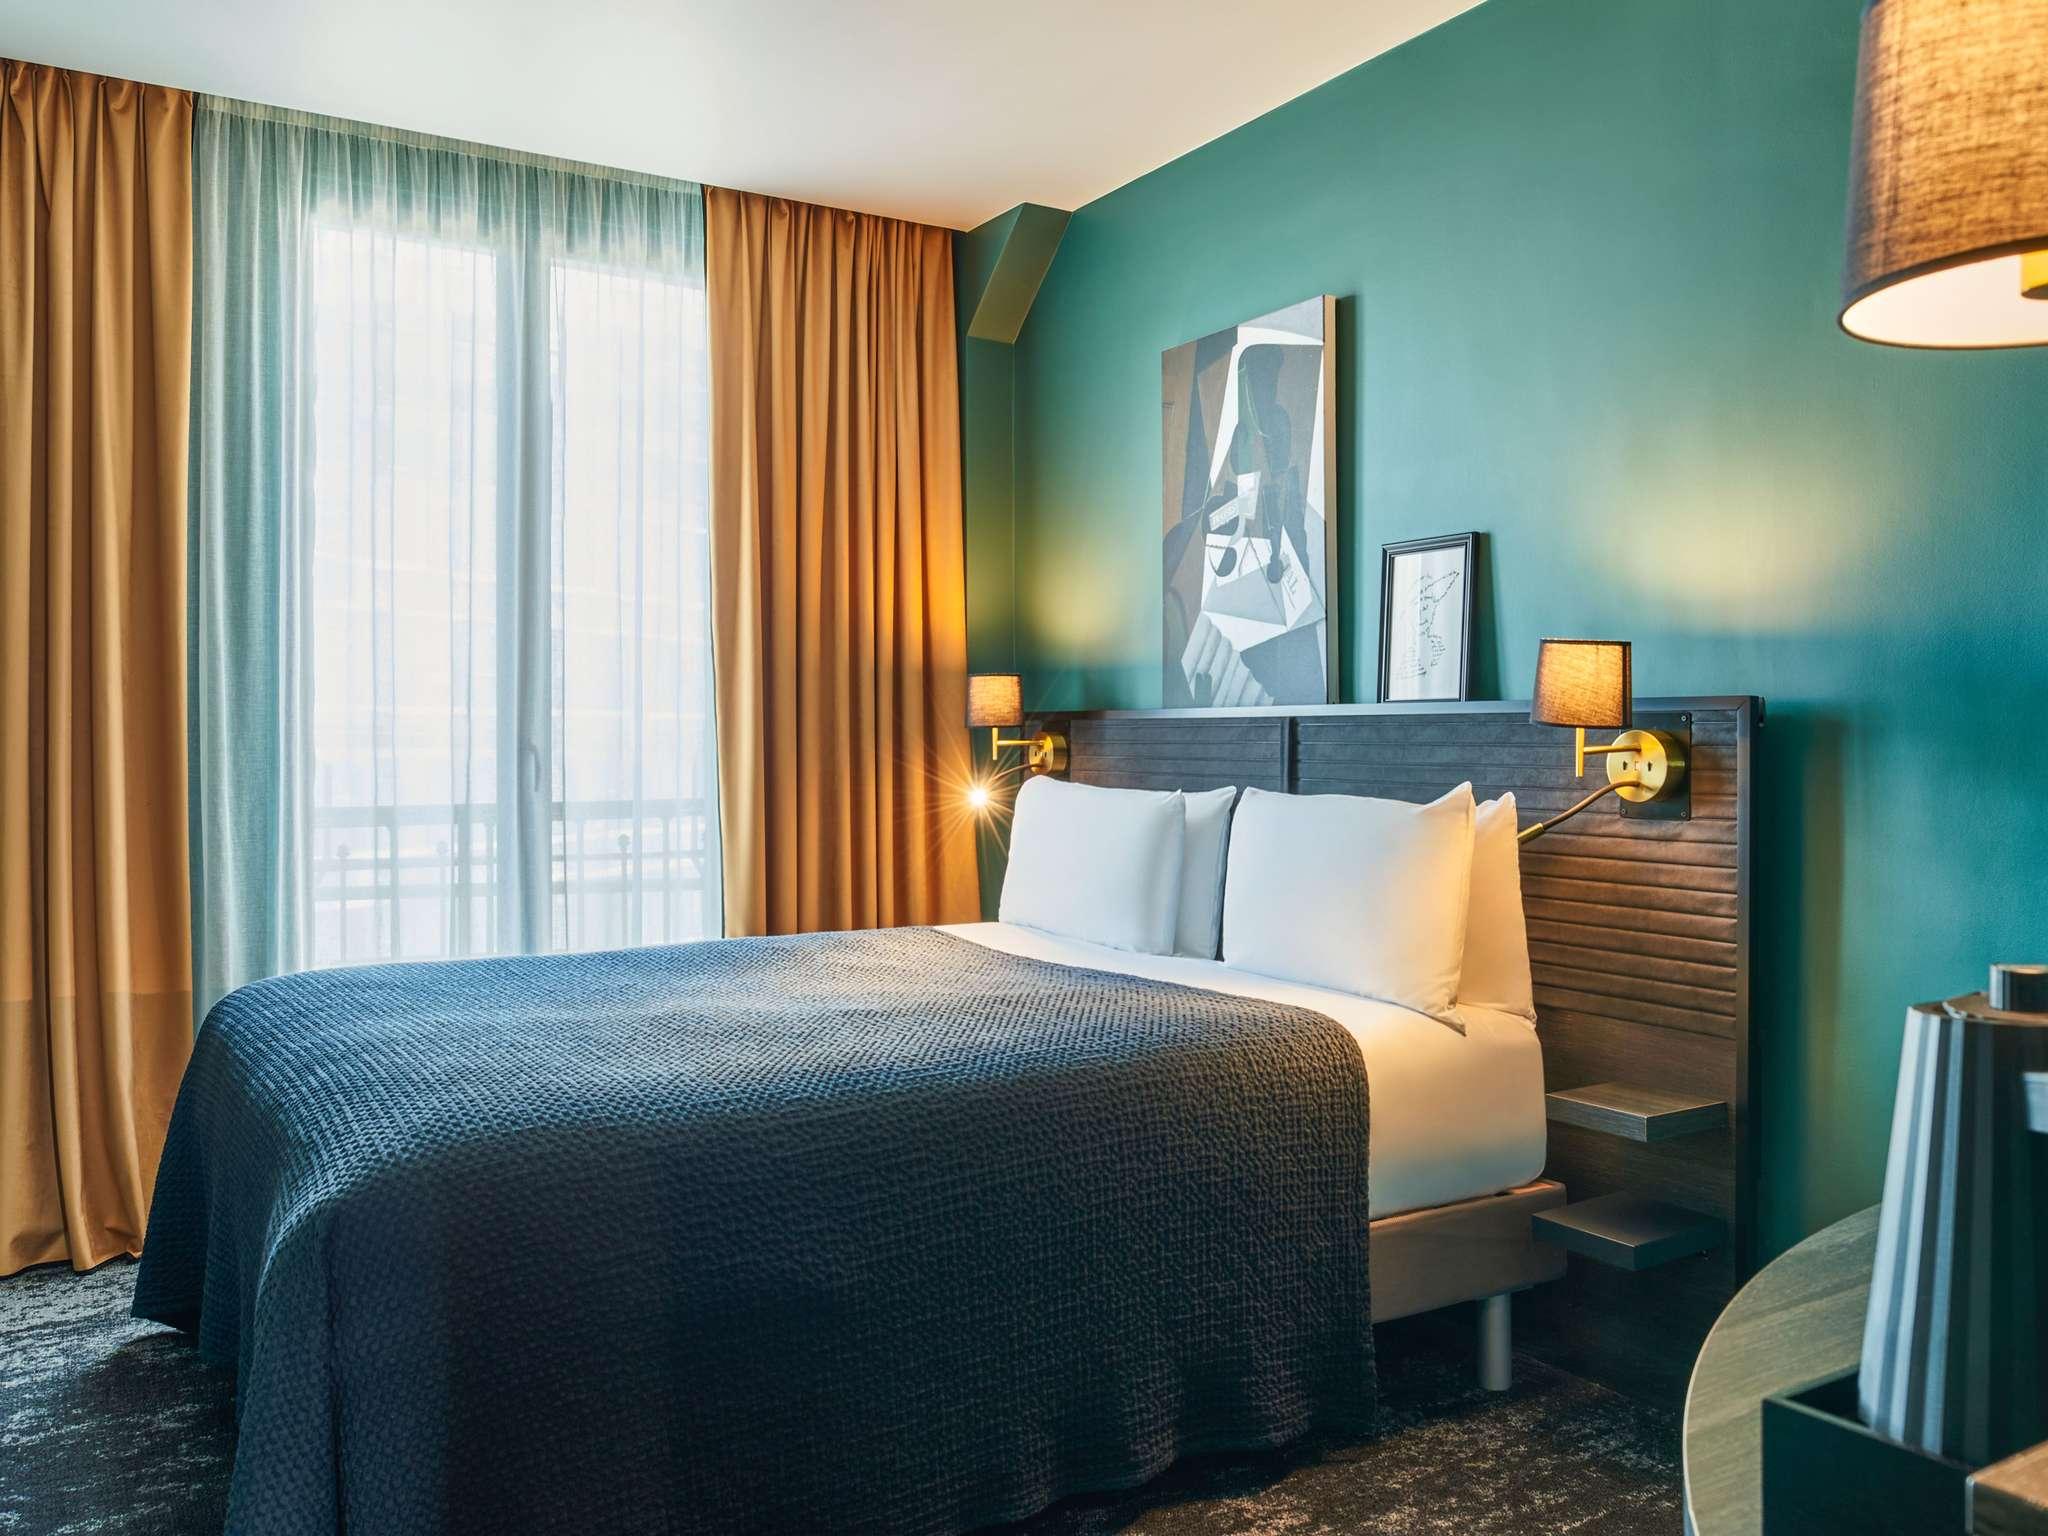 Otel – Mercure Paris Tour Eiffel Pont Mirabeau oteli